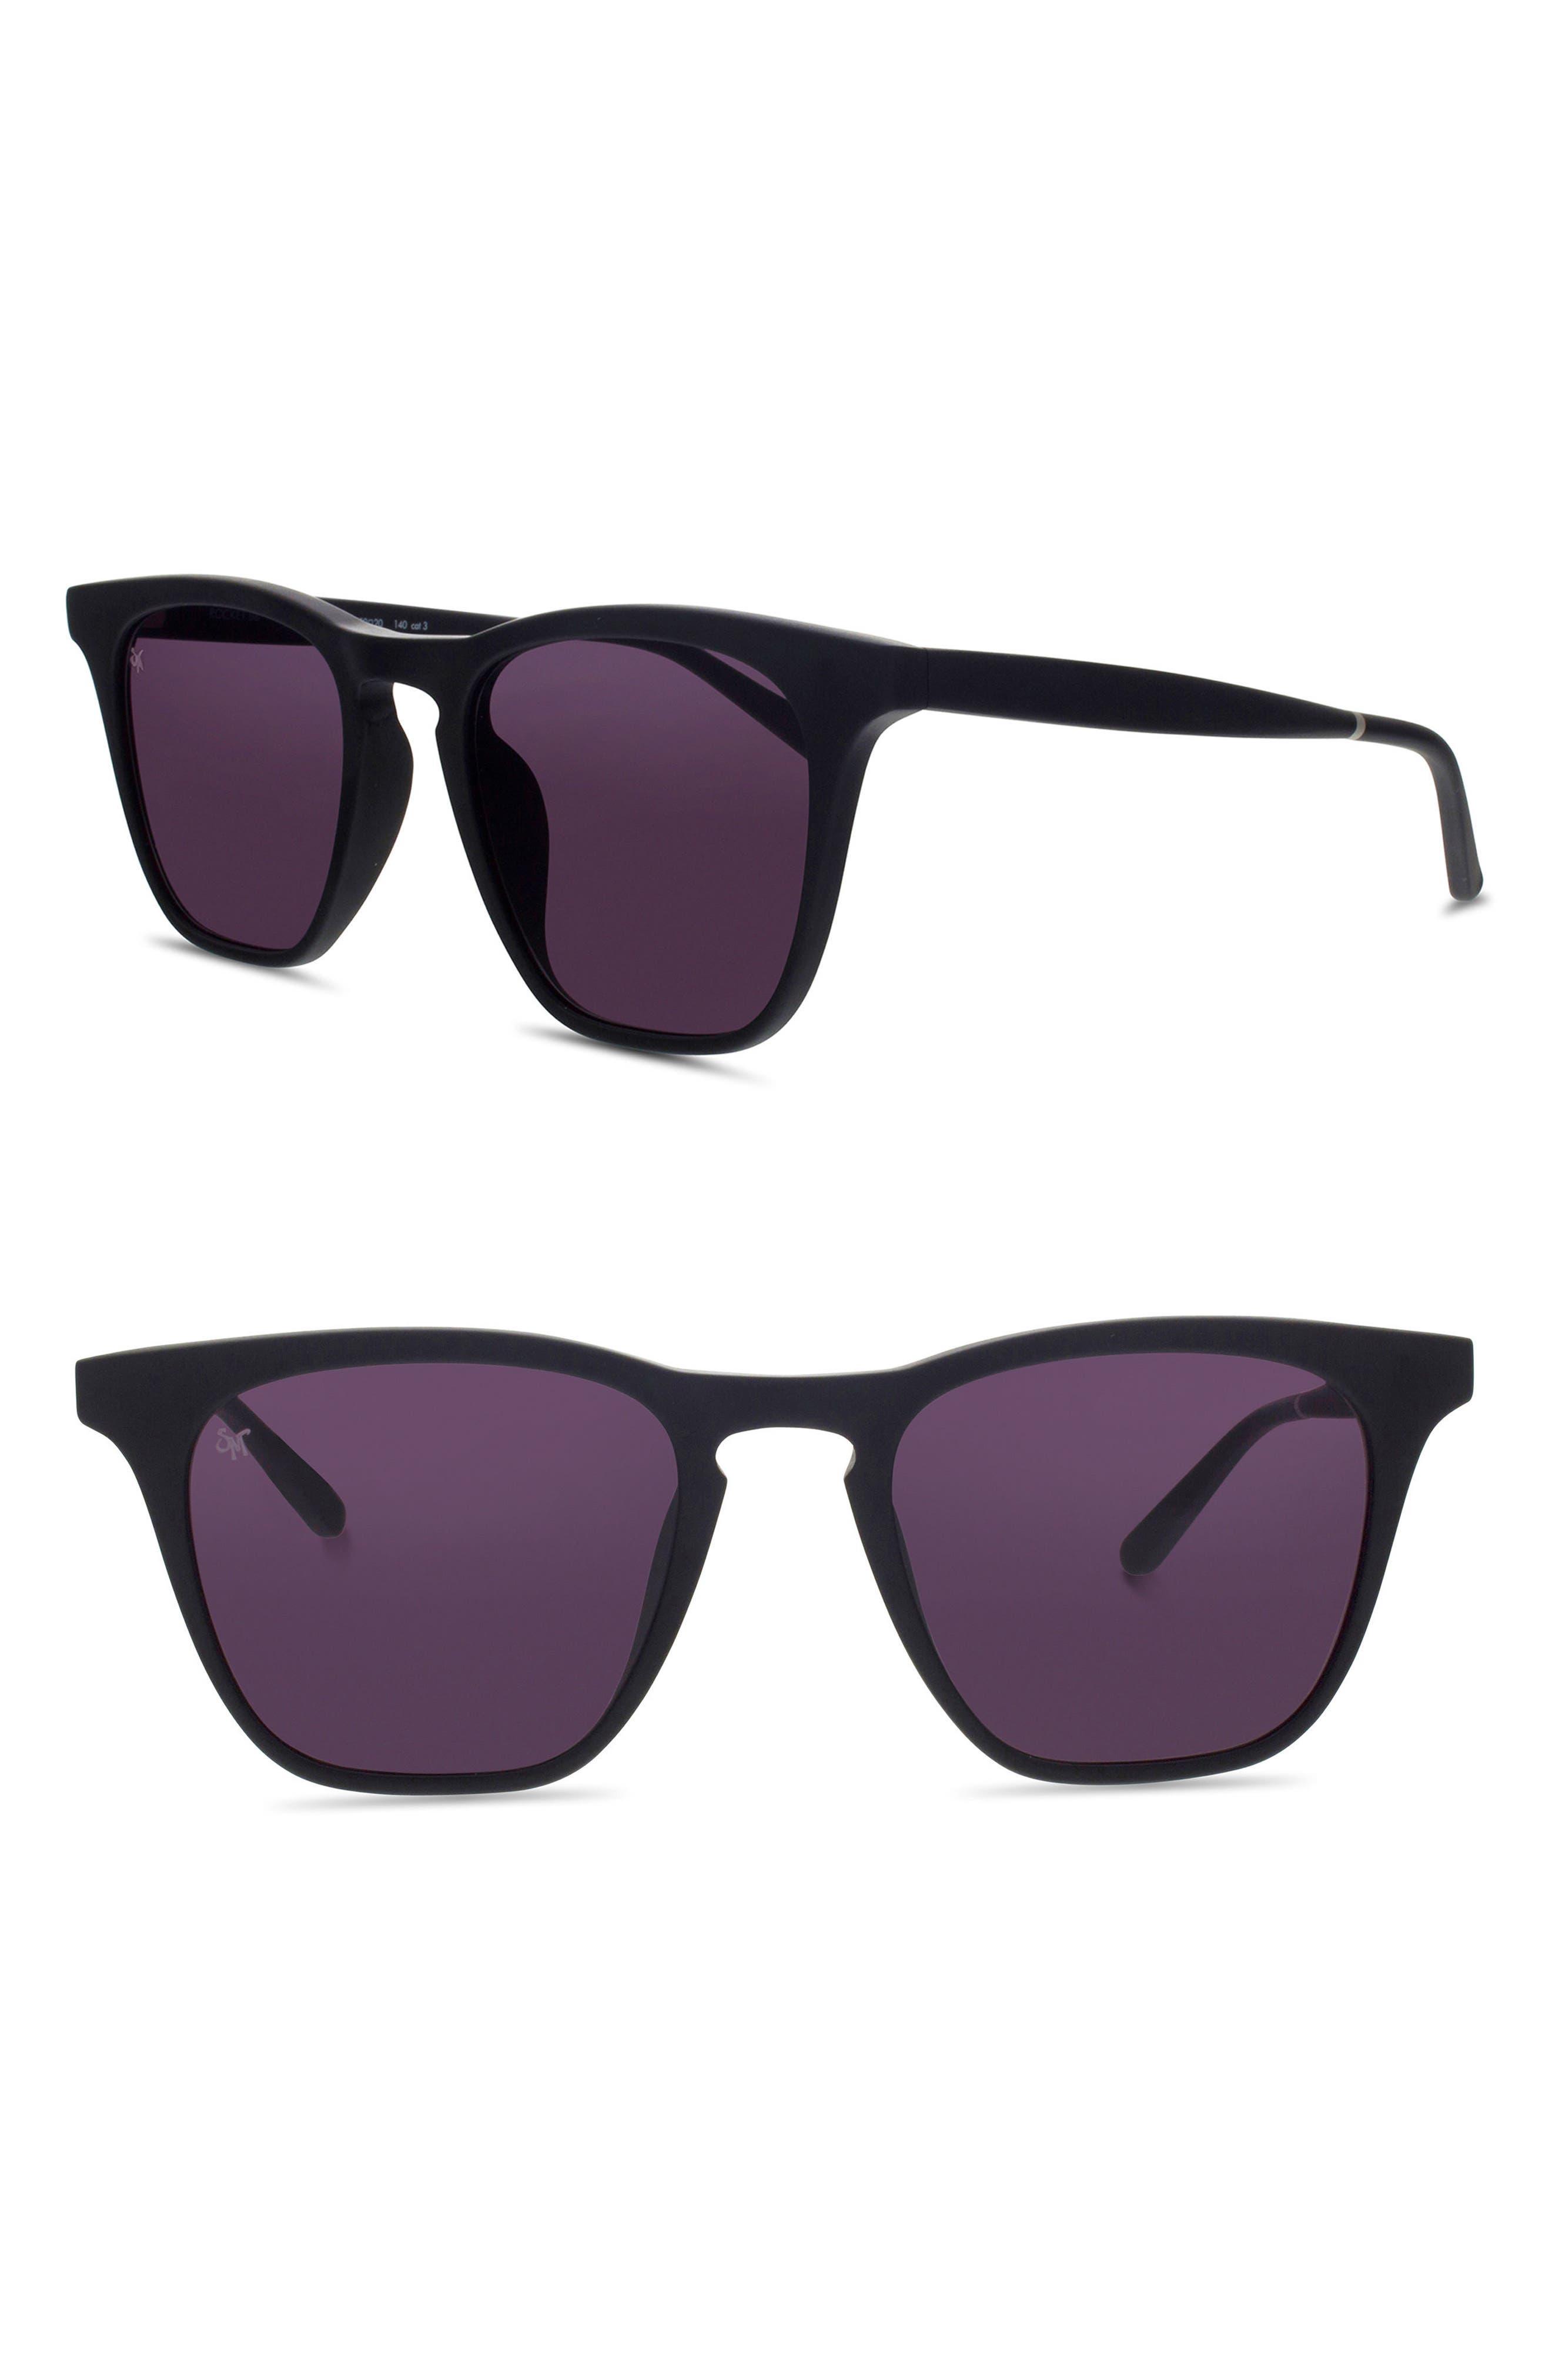 5a00b4a4f1f Smoke X Mirrors Rocket 88 50Mm Square Sunglasses - Matte Black ...